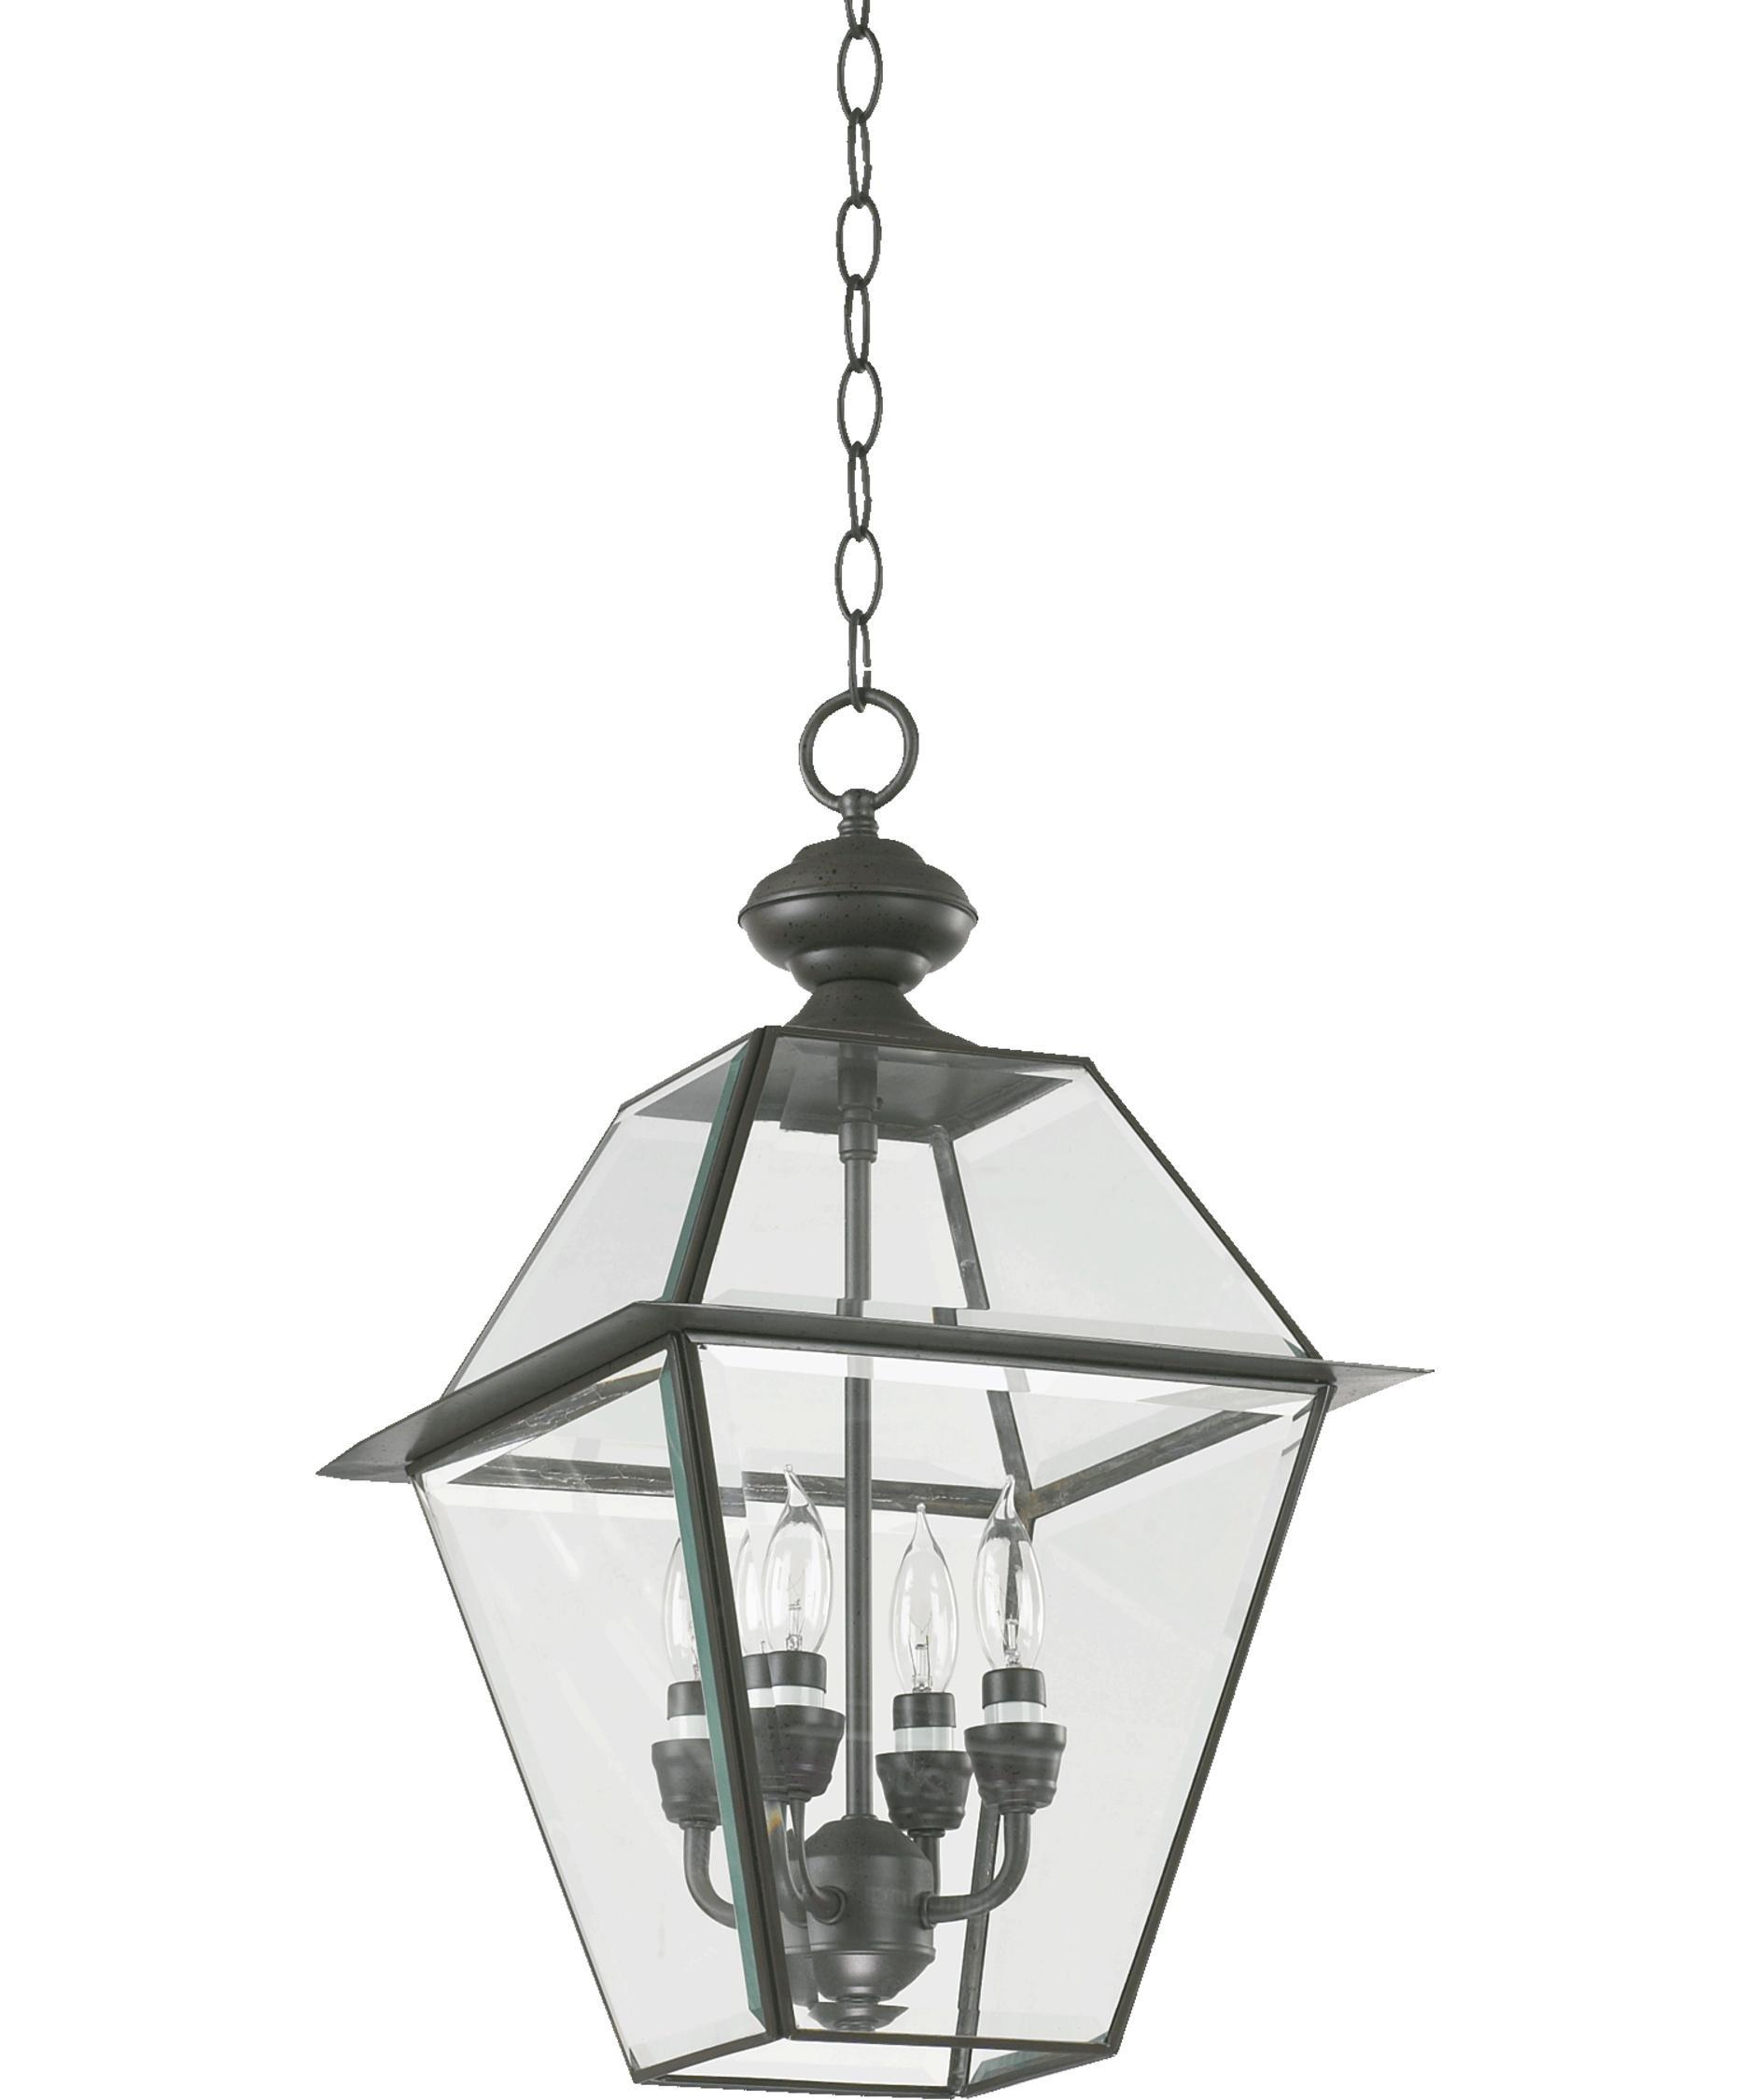 Quorum International 728-4-36 Duvall 4 Light Outdoor Hanging Lantern in Bronze by Quorum